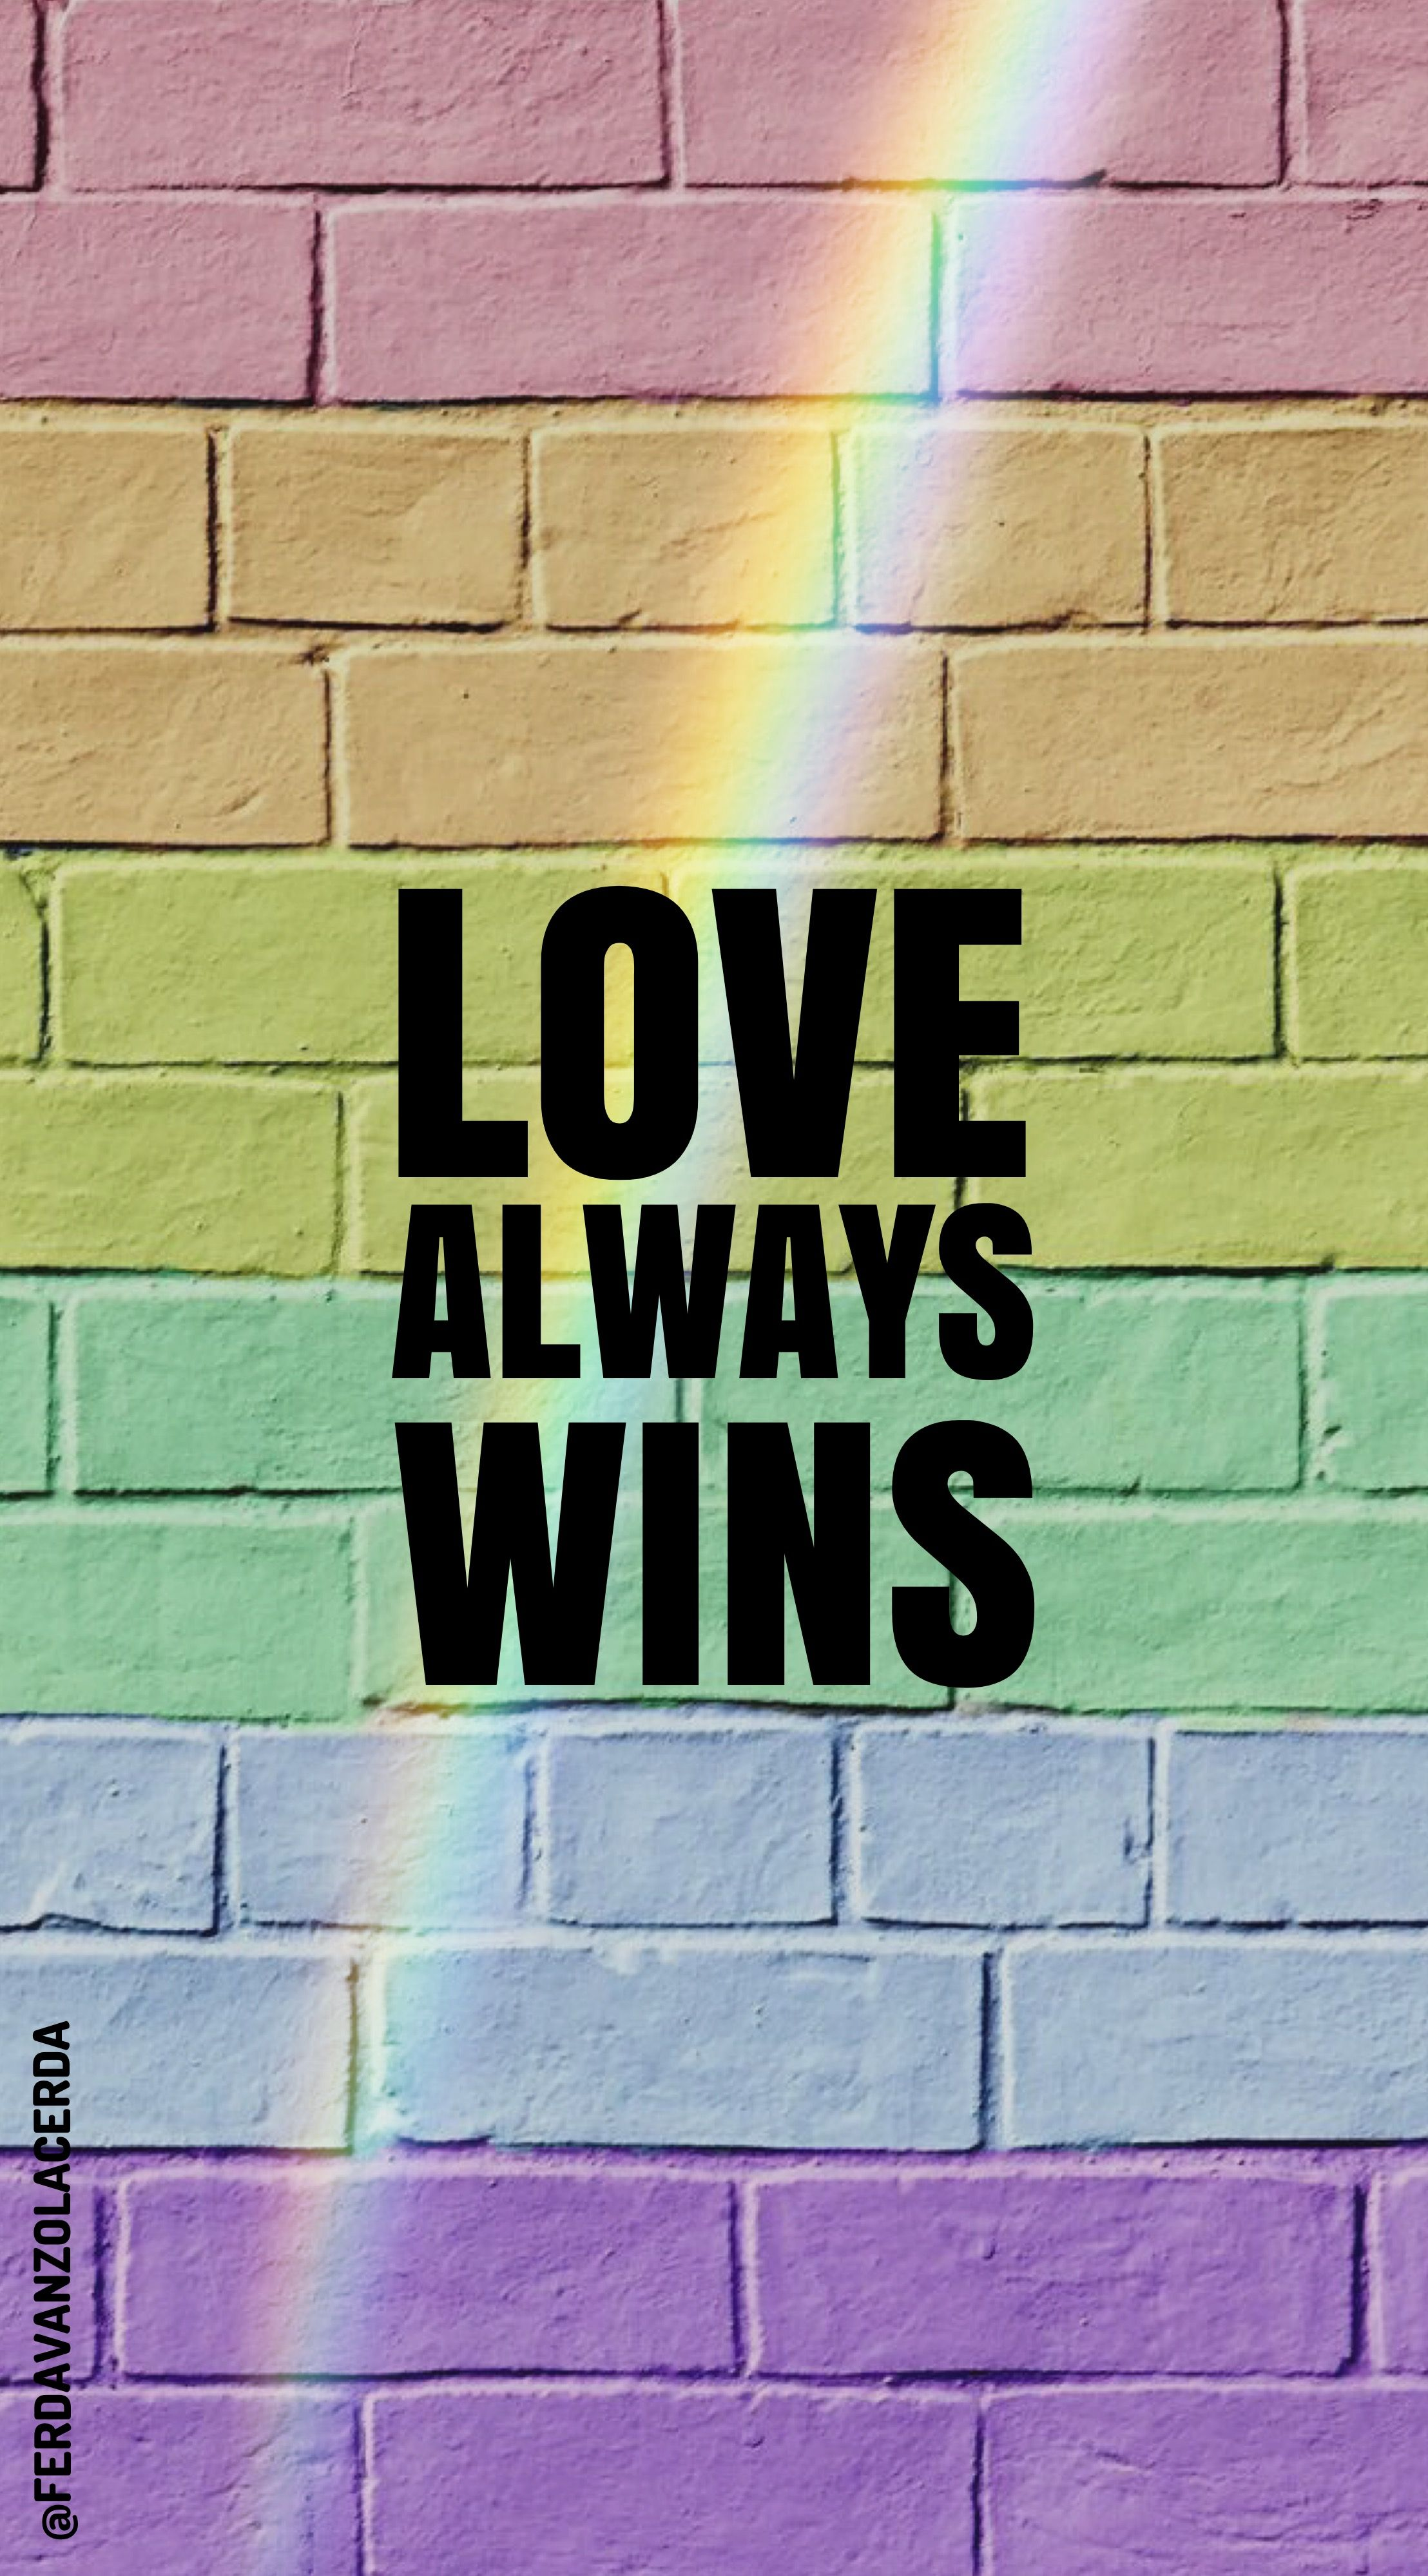 Love Always Wins Download Cute Wallpapers Wallpaper Iphone Cute Iphone Wallpaper